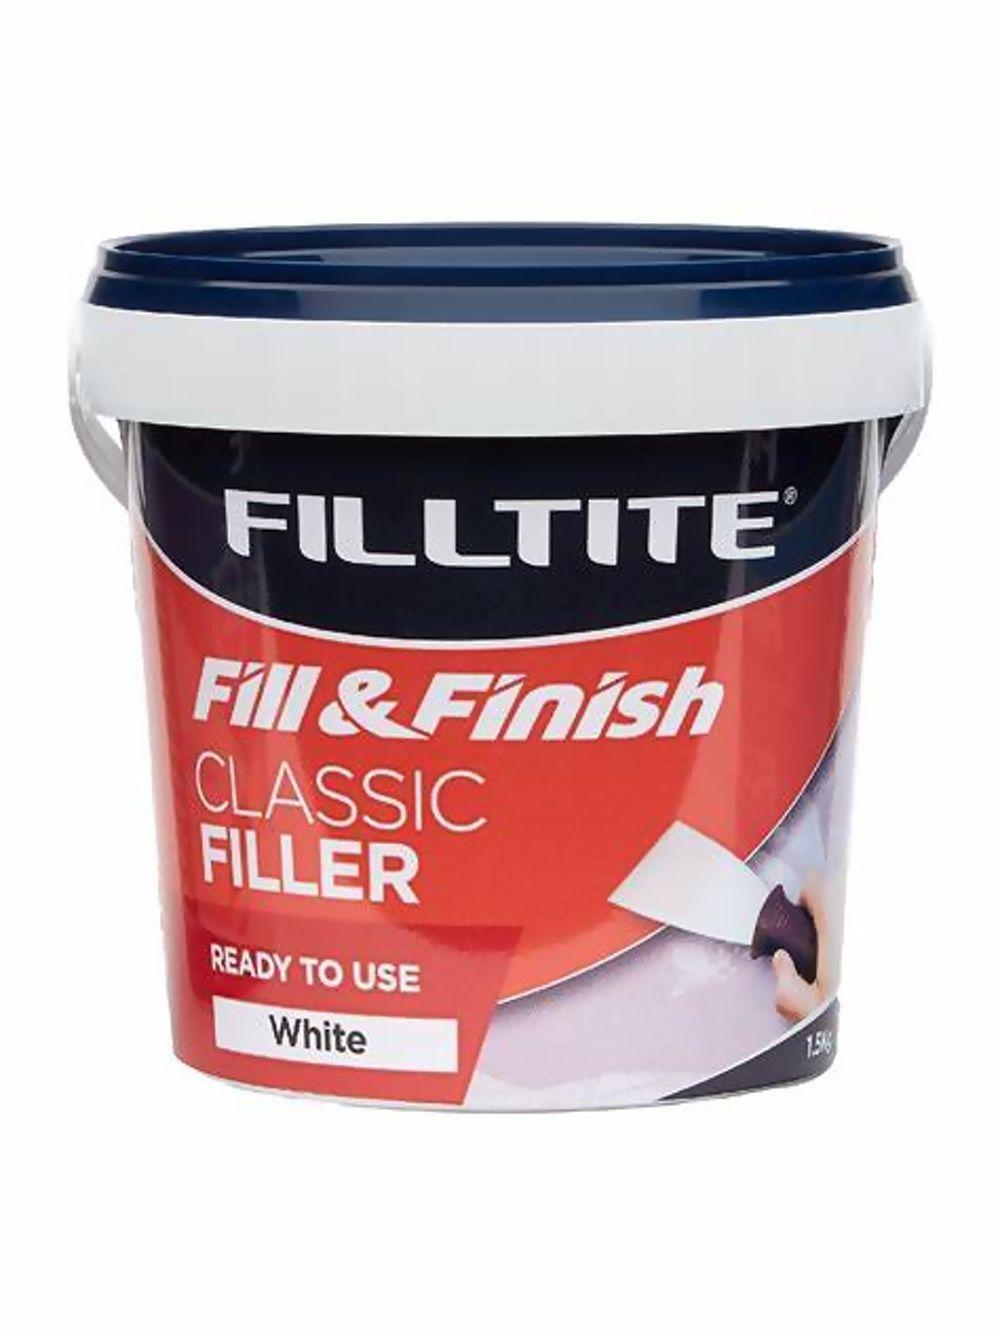 Filltite Fill & Finish Ready Mixed Classic Filler Ref F18365